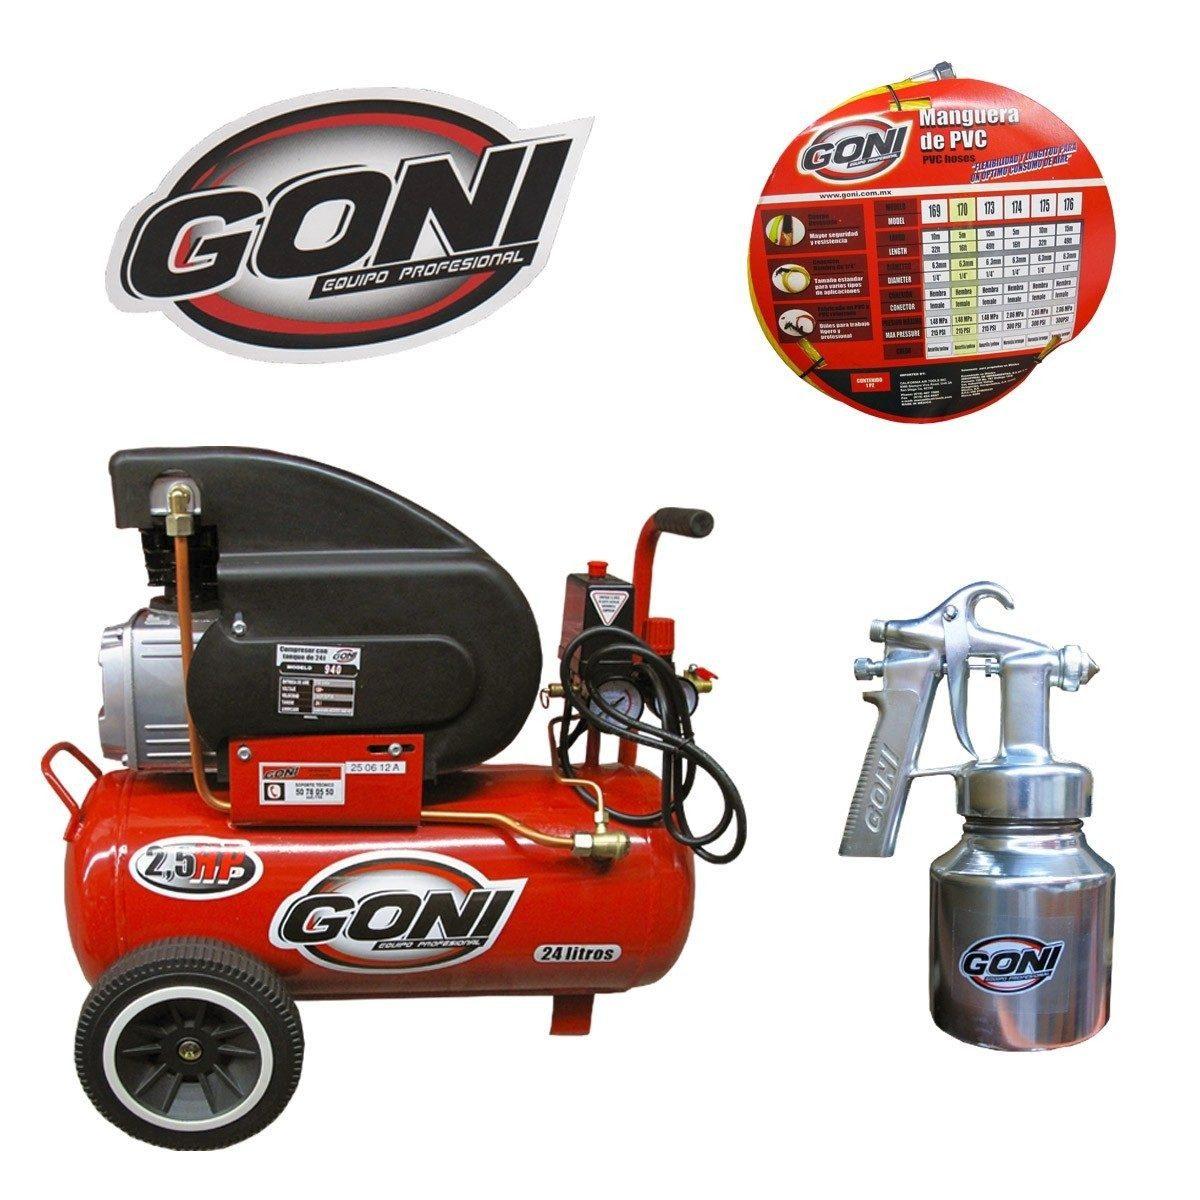 Kit compresor goni 2 5 hp 25 litros 2 en - Compresor de aire 25 litros ...